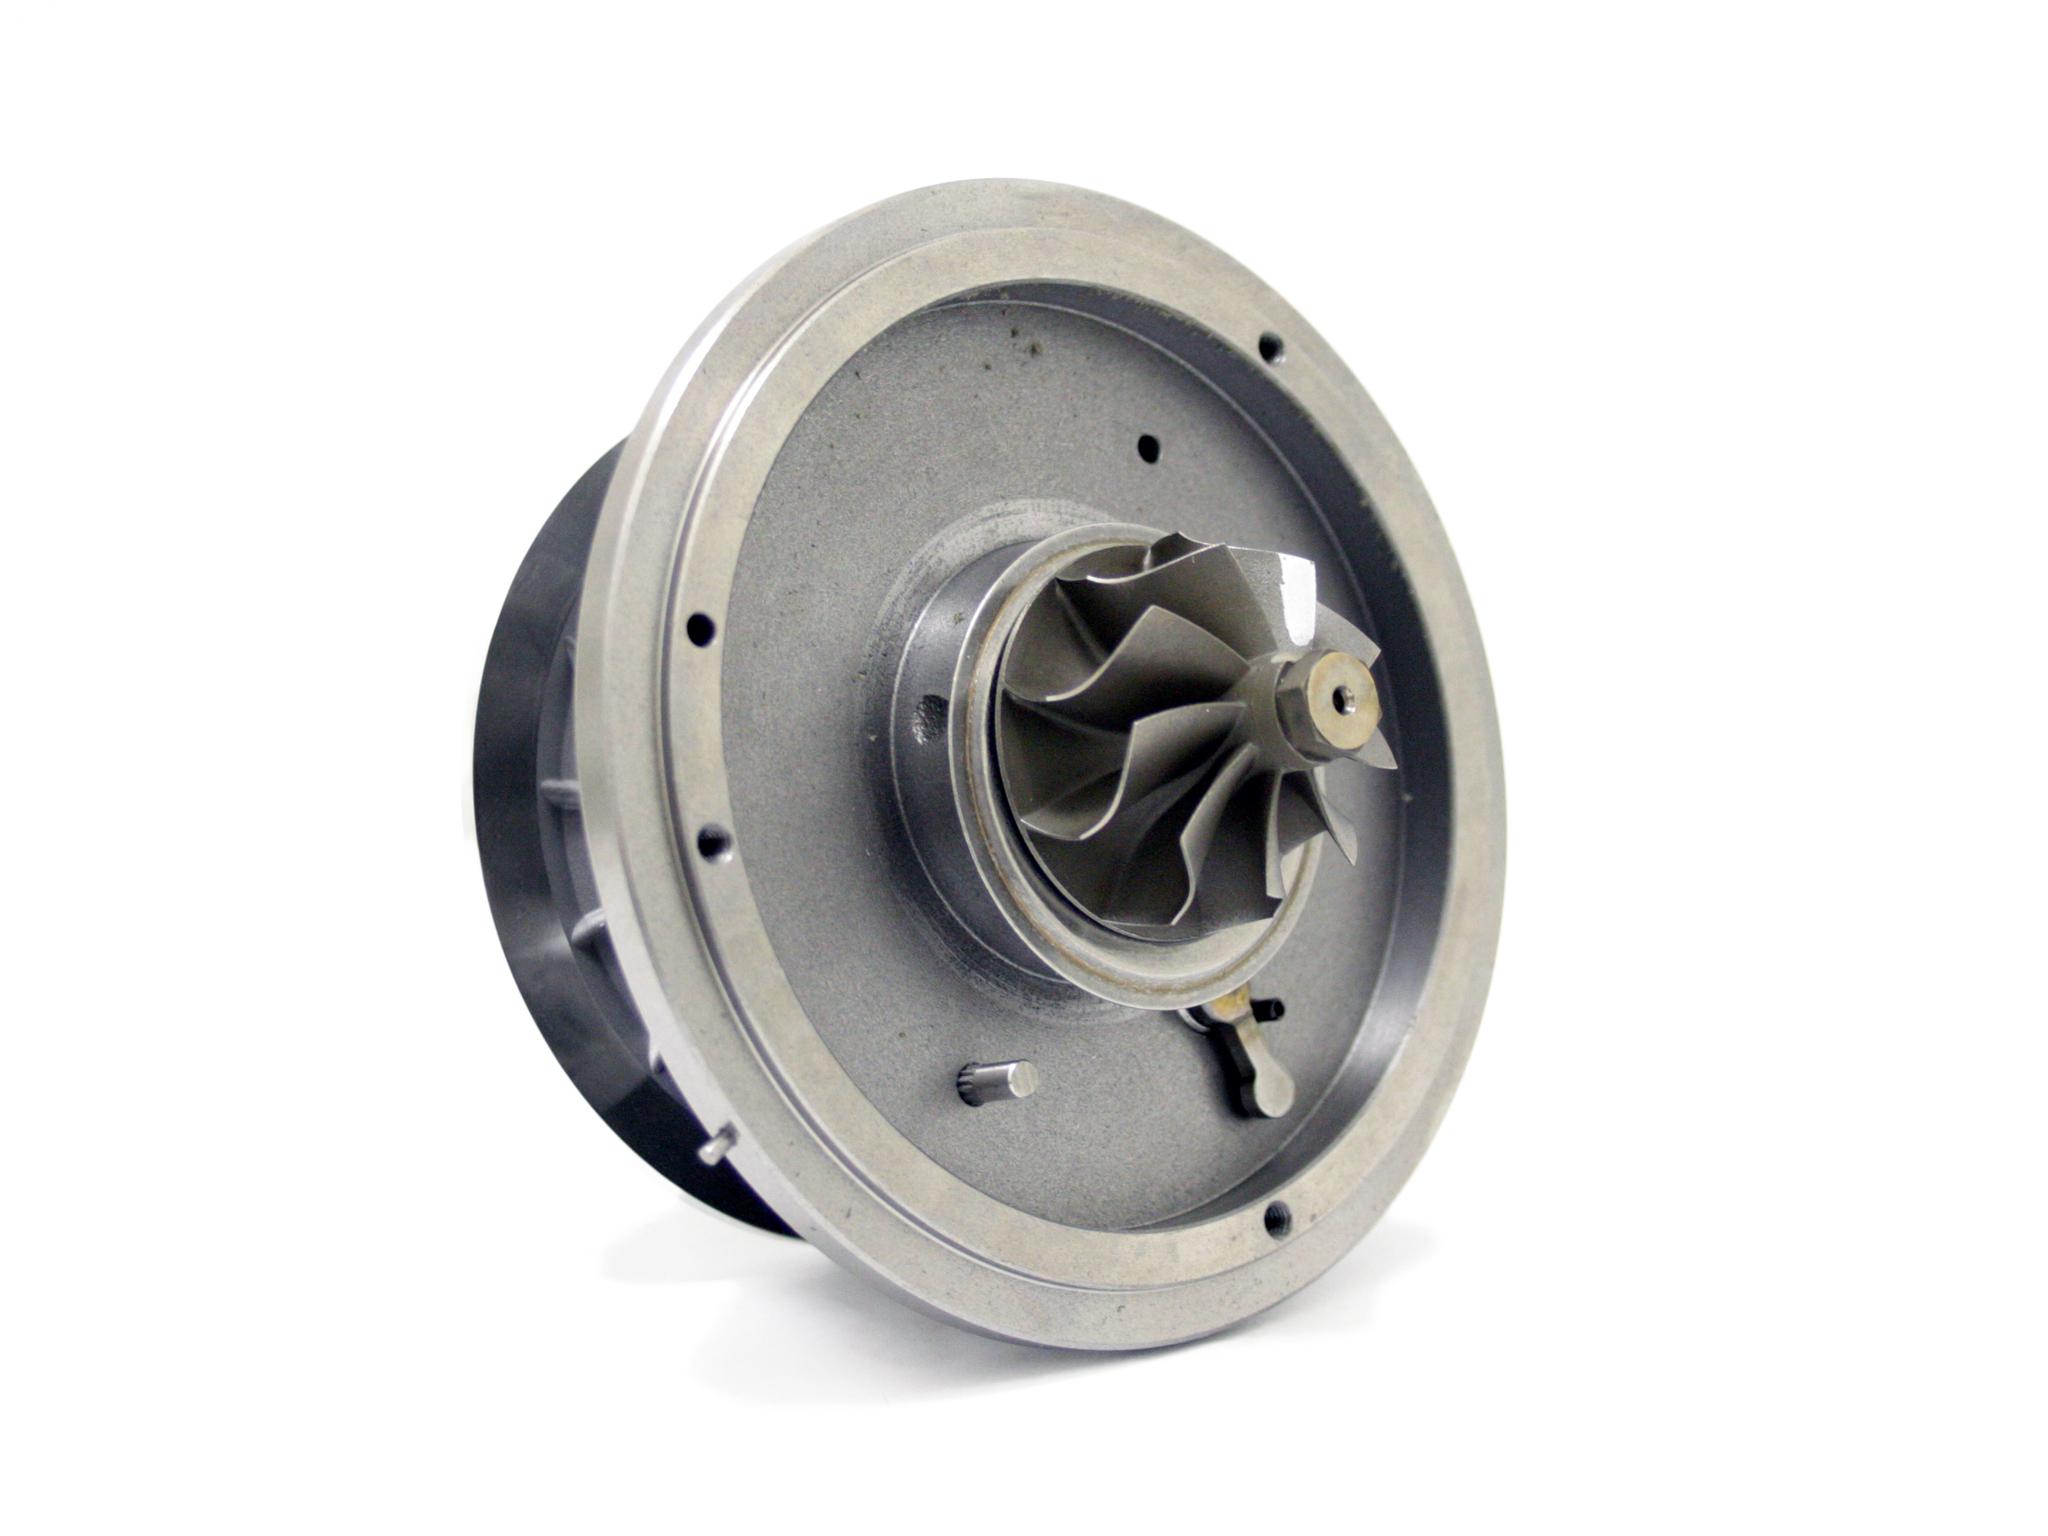 Картридж турбины GTB1549 Санг Енг 2.0 Xdi D20DT 141 л.с.